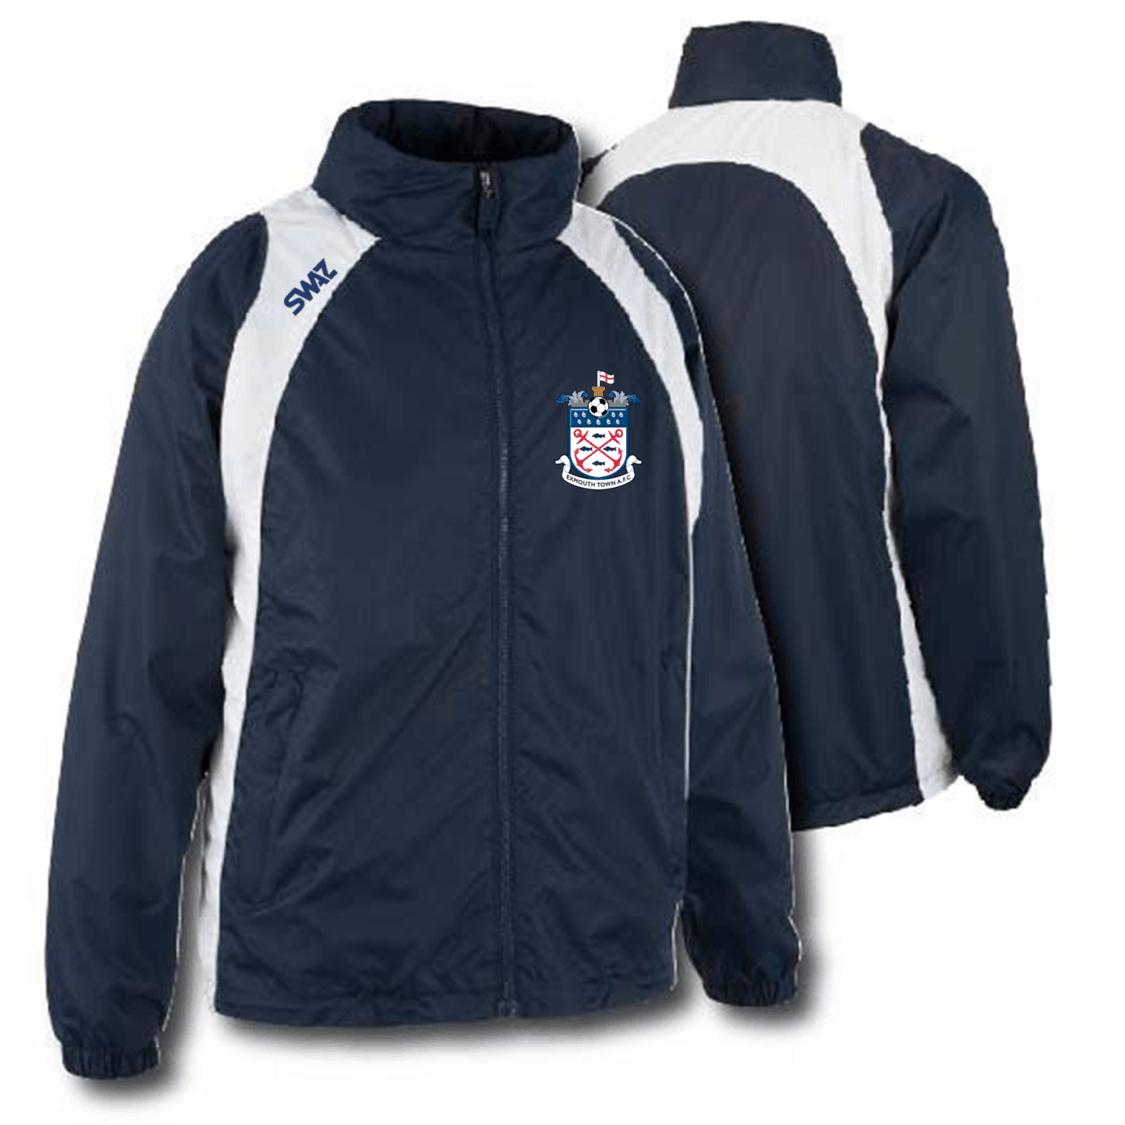 Exmouth Town Showerproof Jacket | SWAZ Teamwear | Comfort & Design